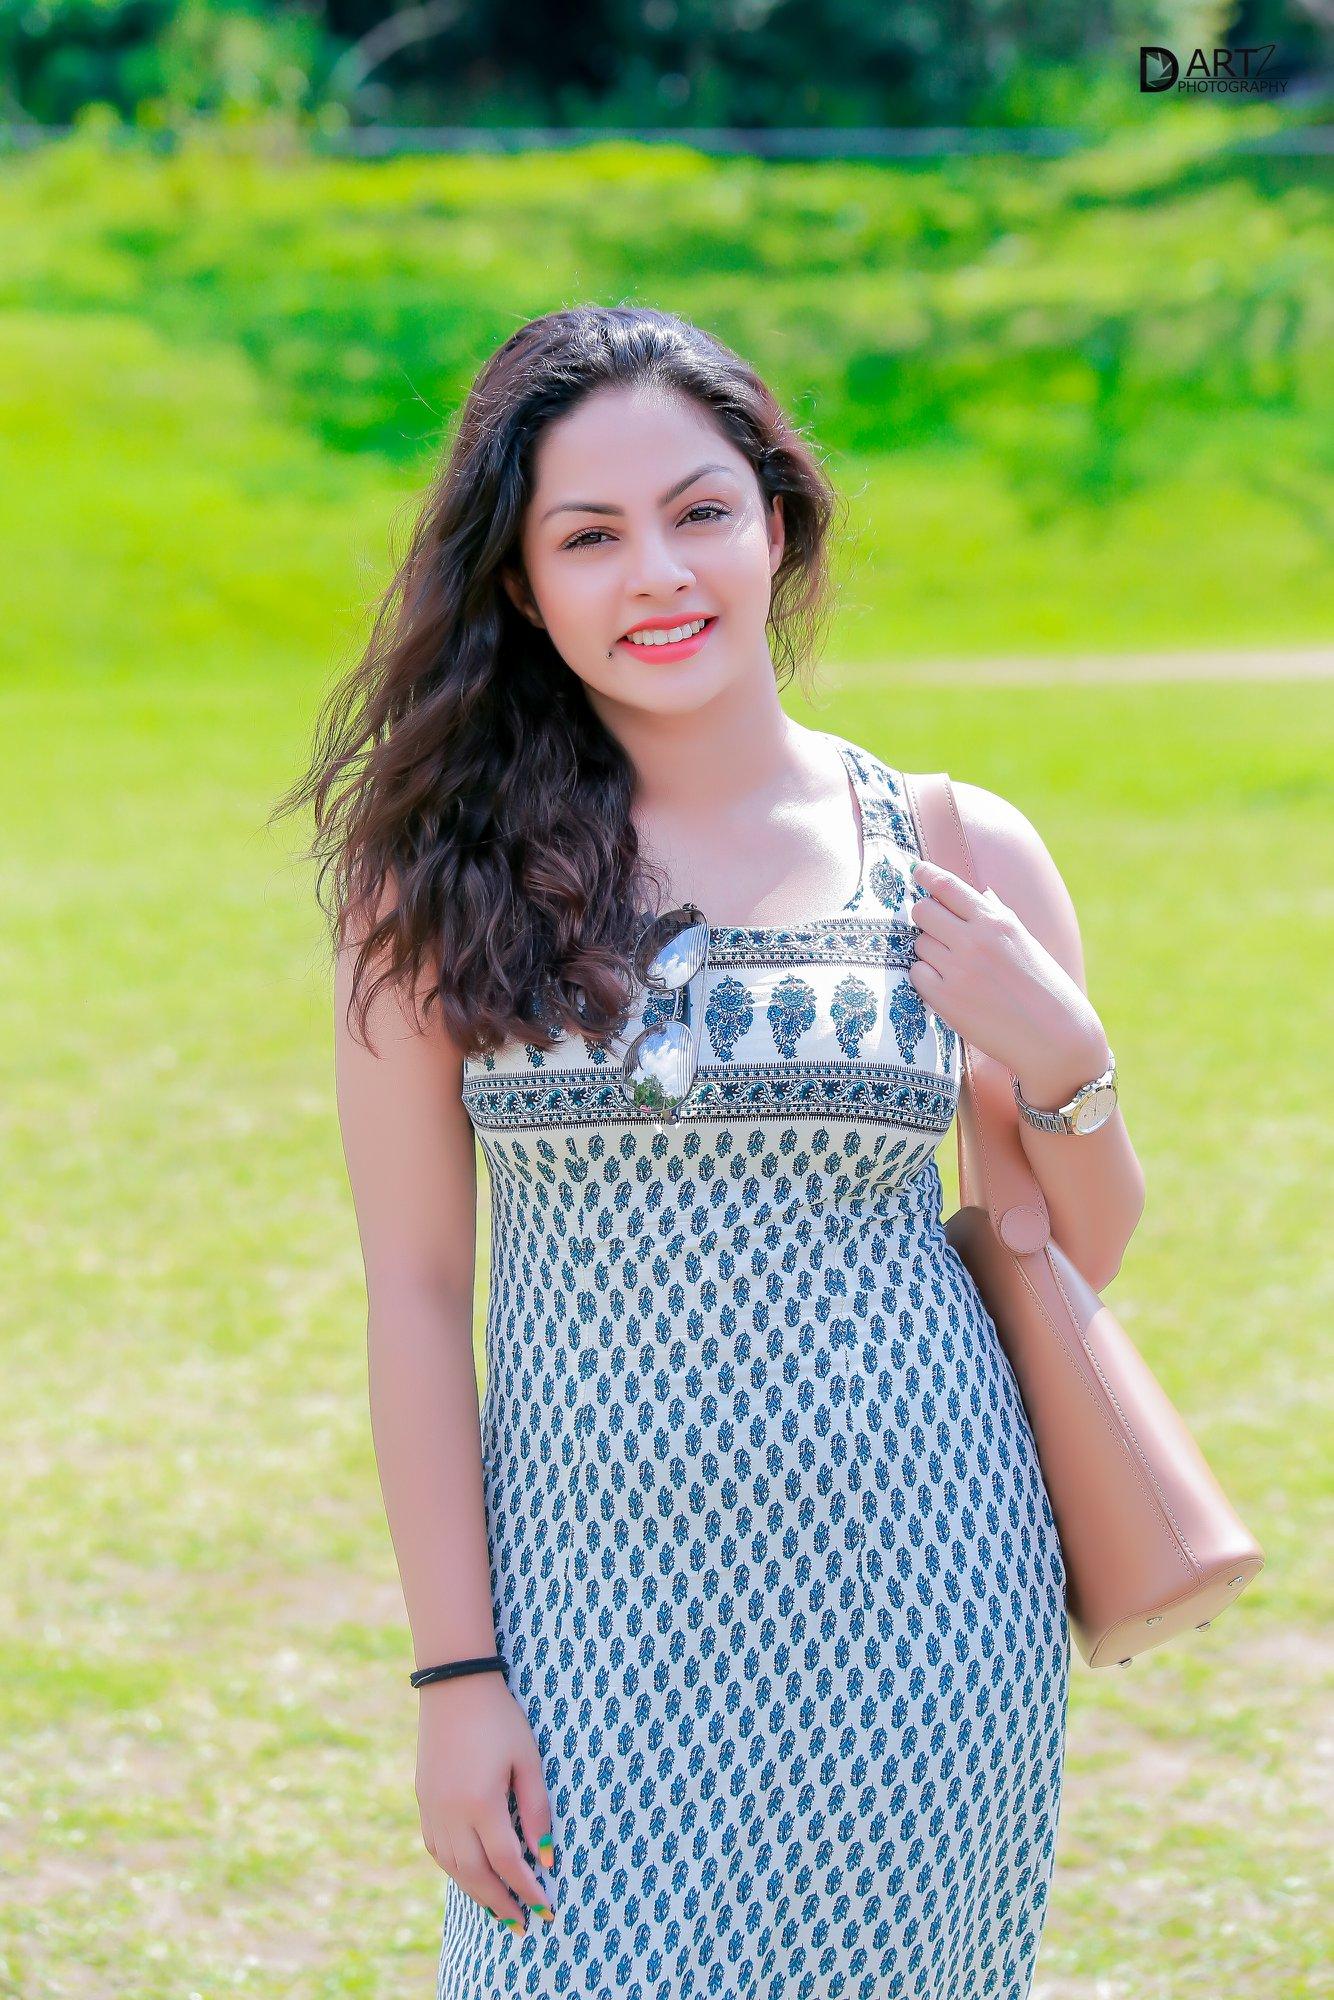 shalani-tharaka-lanka-web-gossip-12